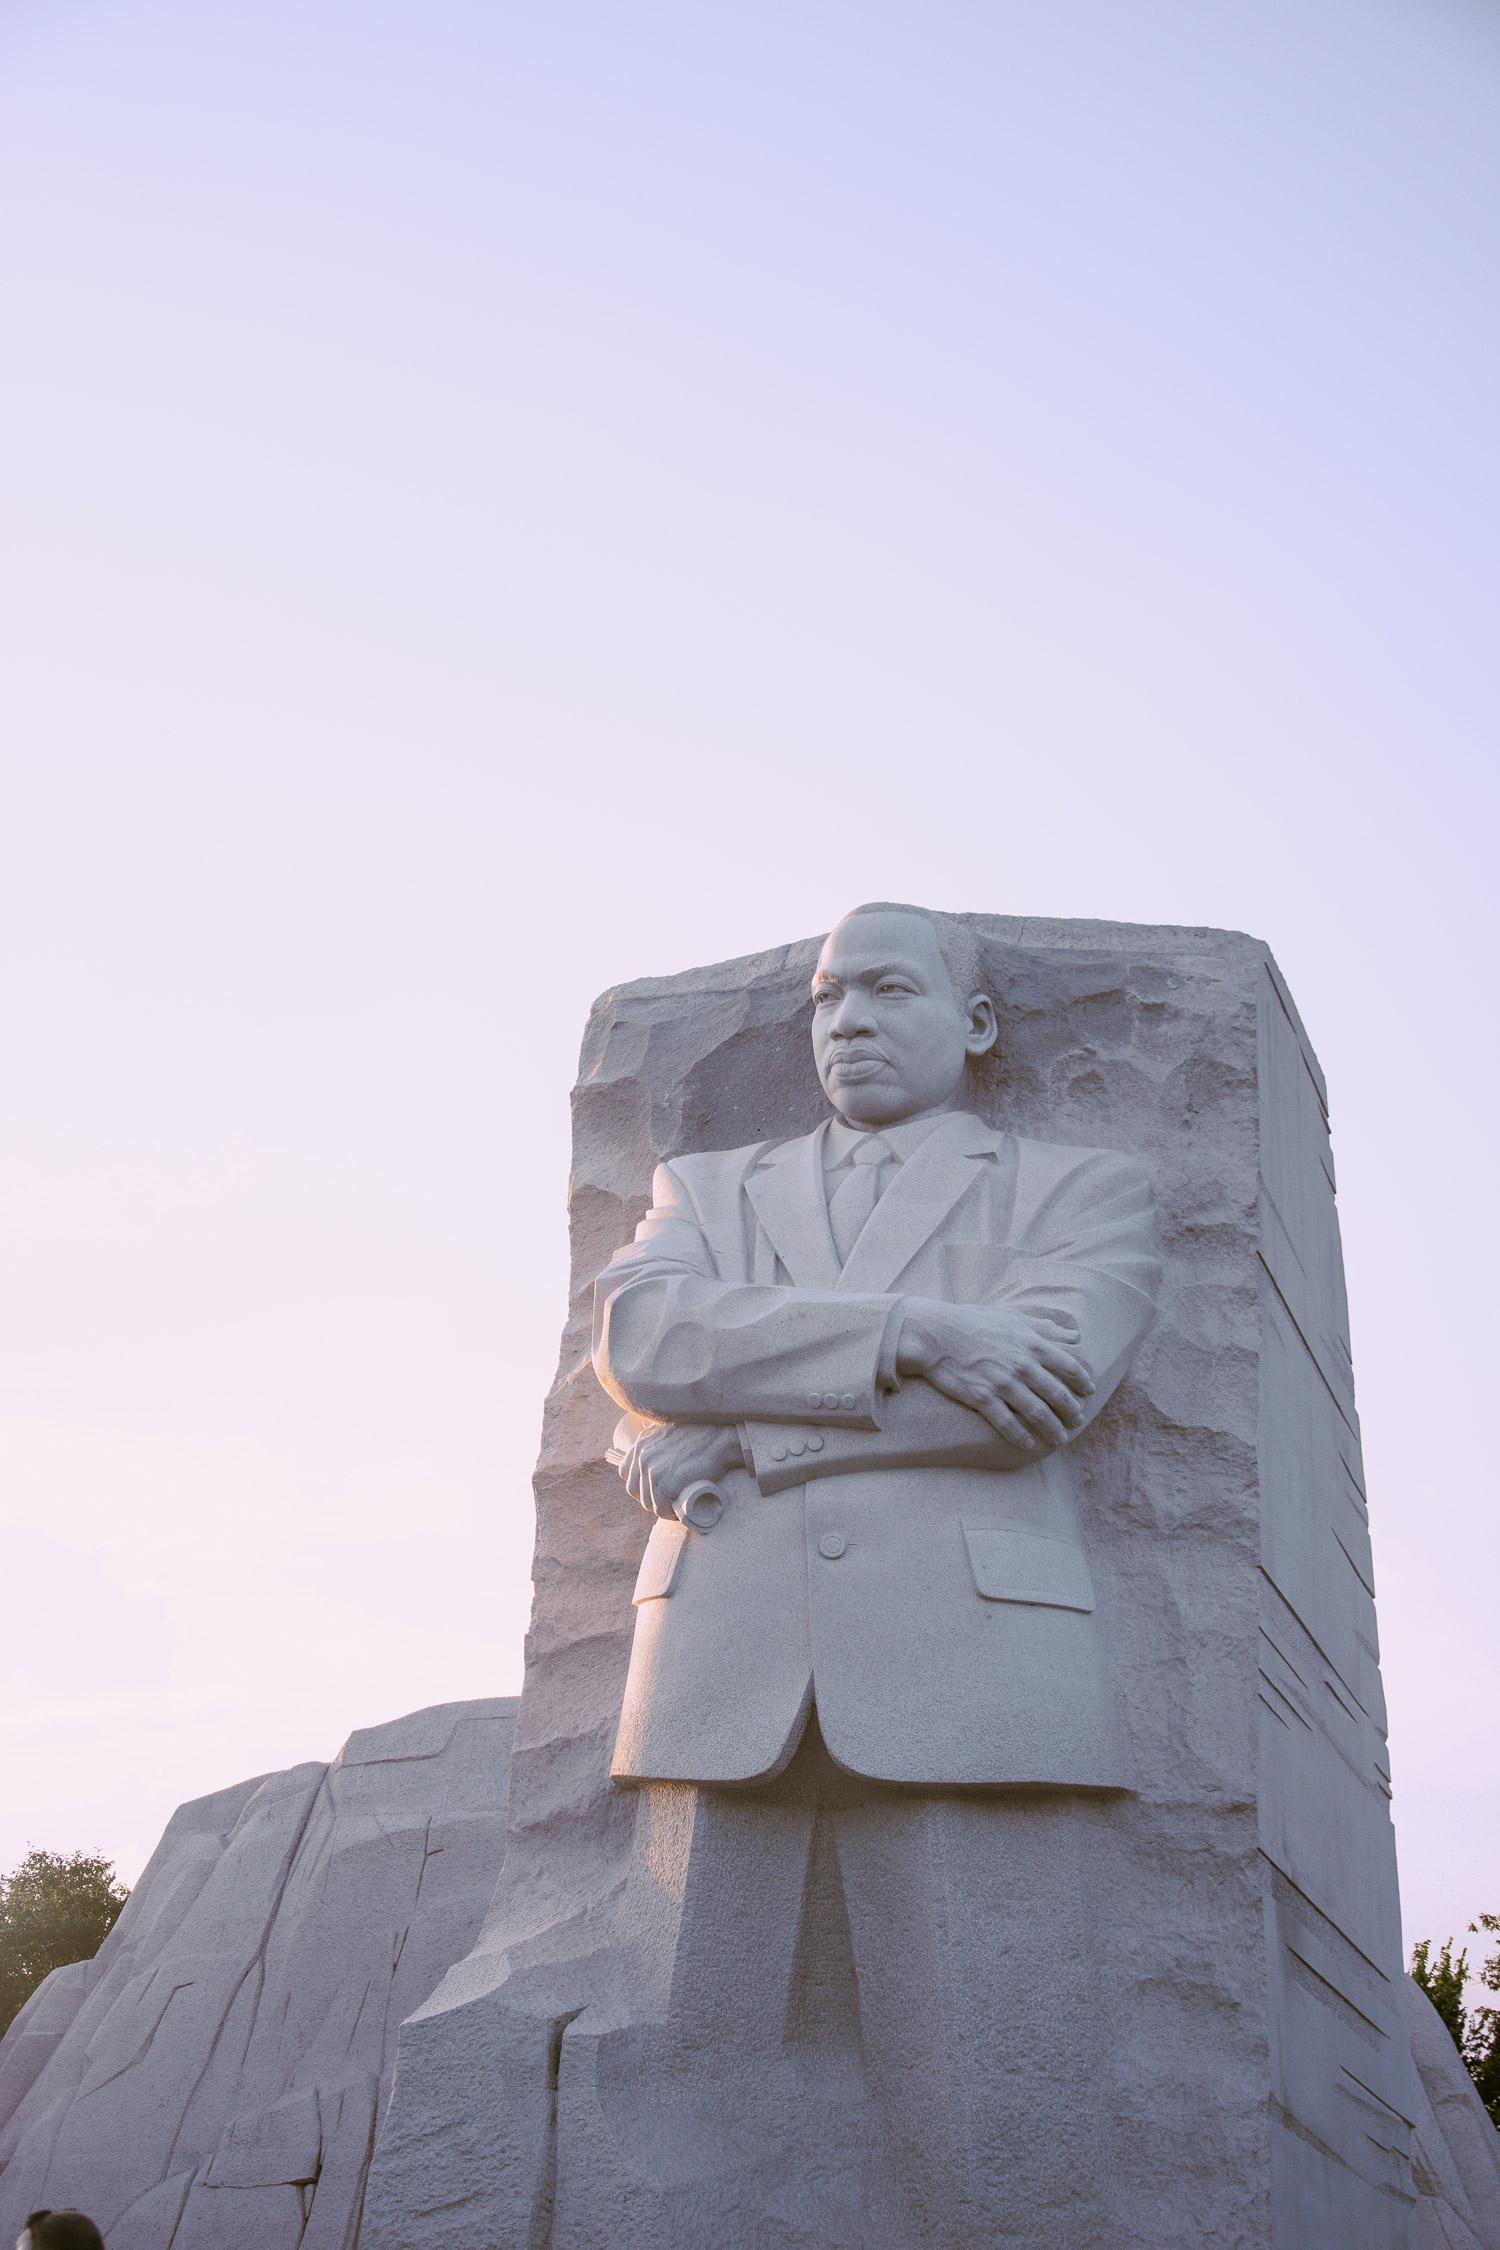 Martin_Luther_King_Jr_Memorial_Washington_DC_2018_Ruo_Ling_Lu.jpg